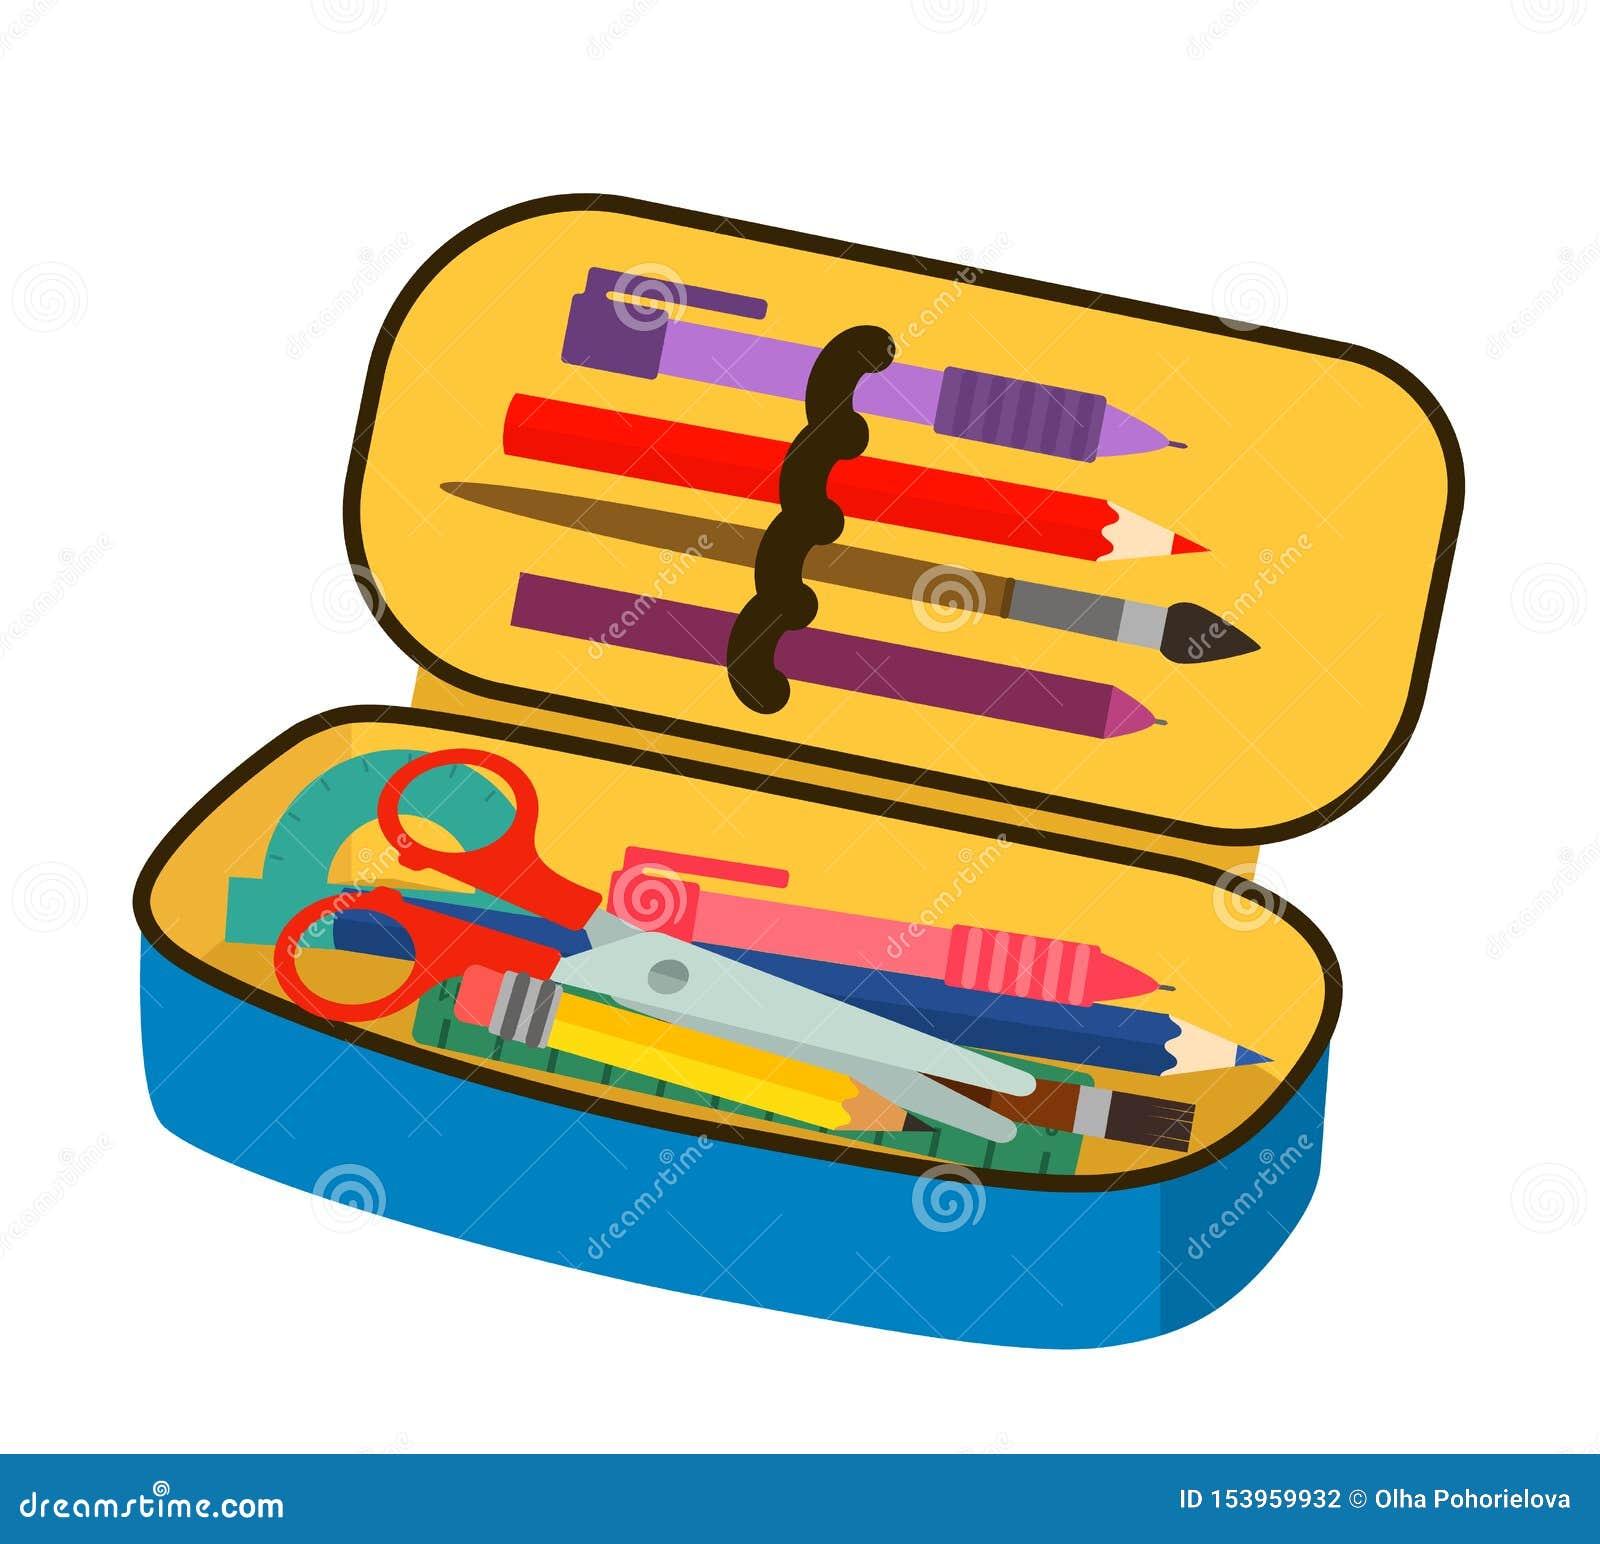 A pencil case Clipart   k13470655   Fotosearch